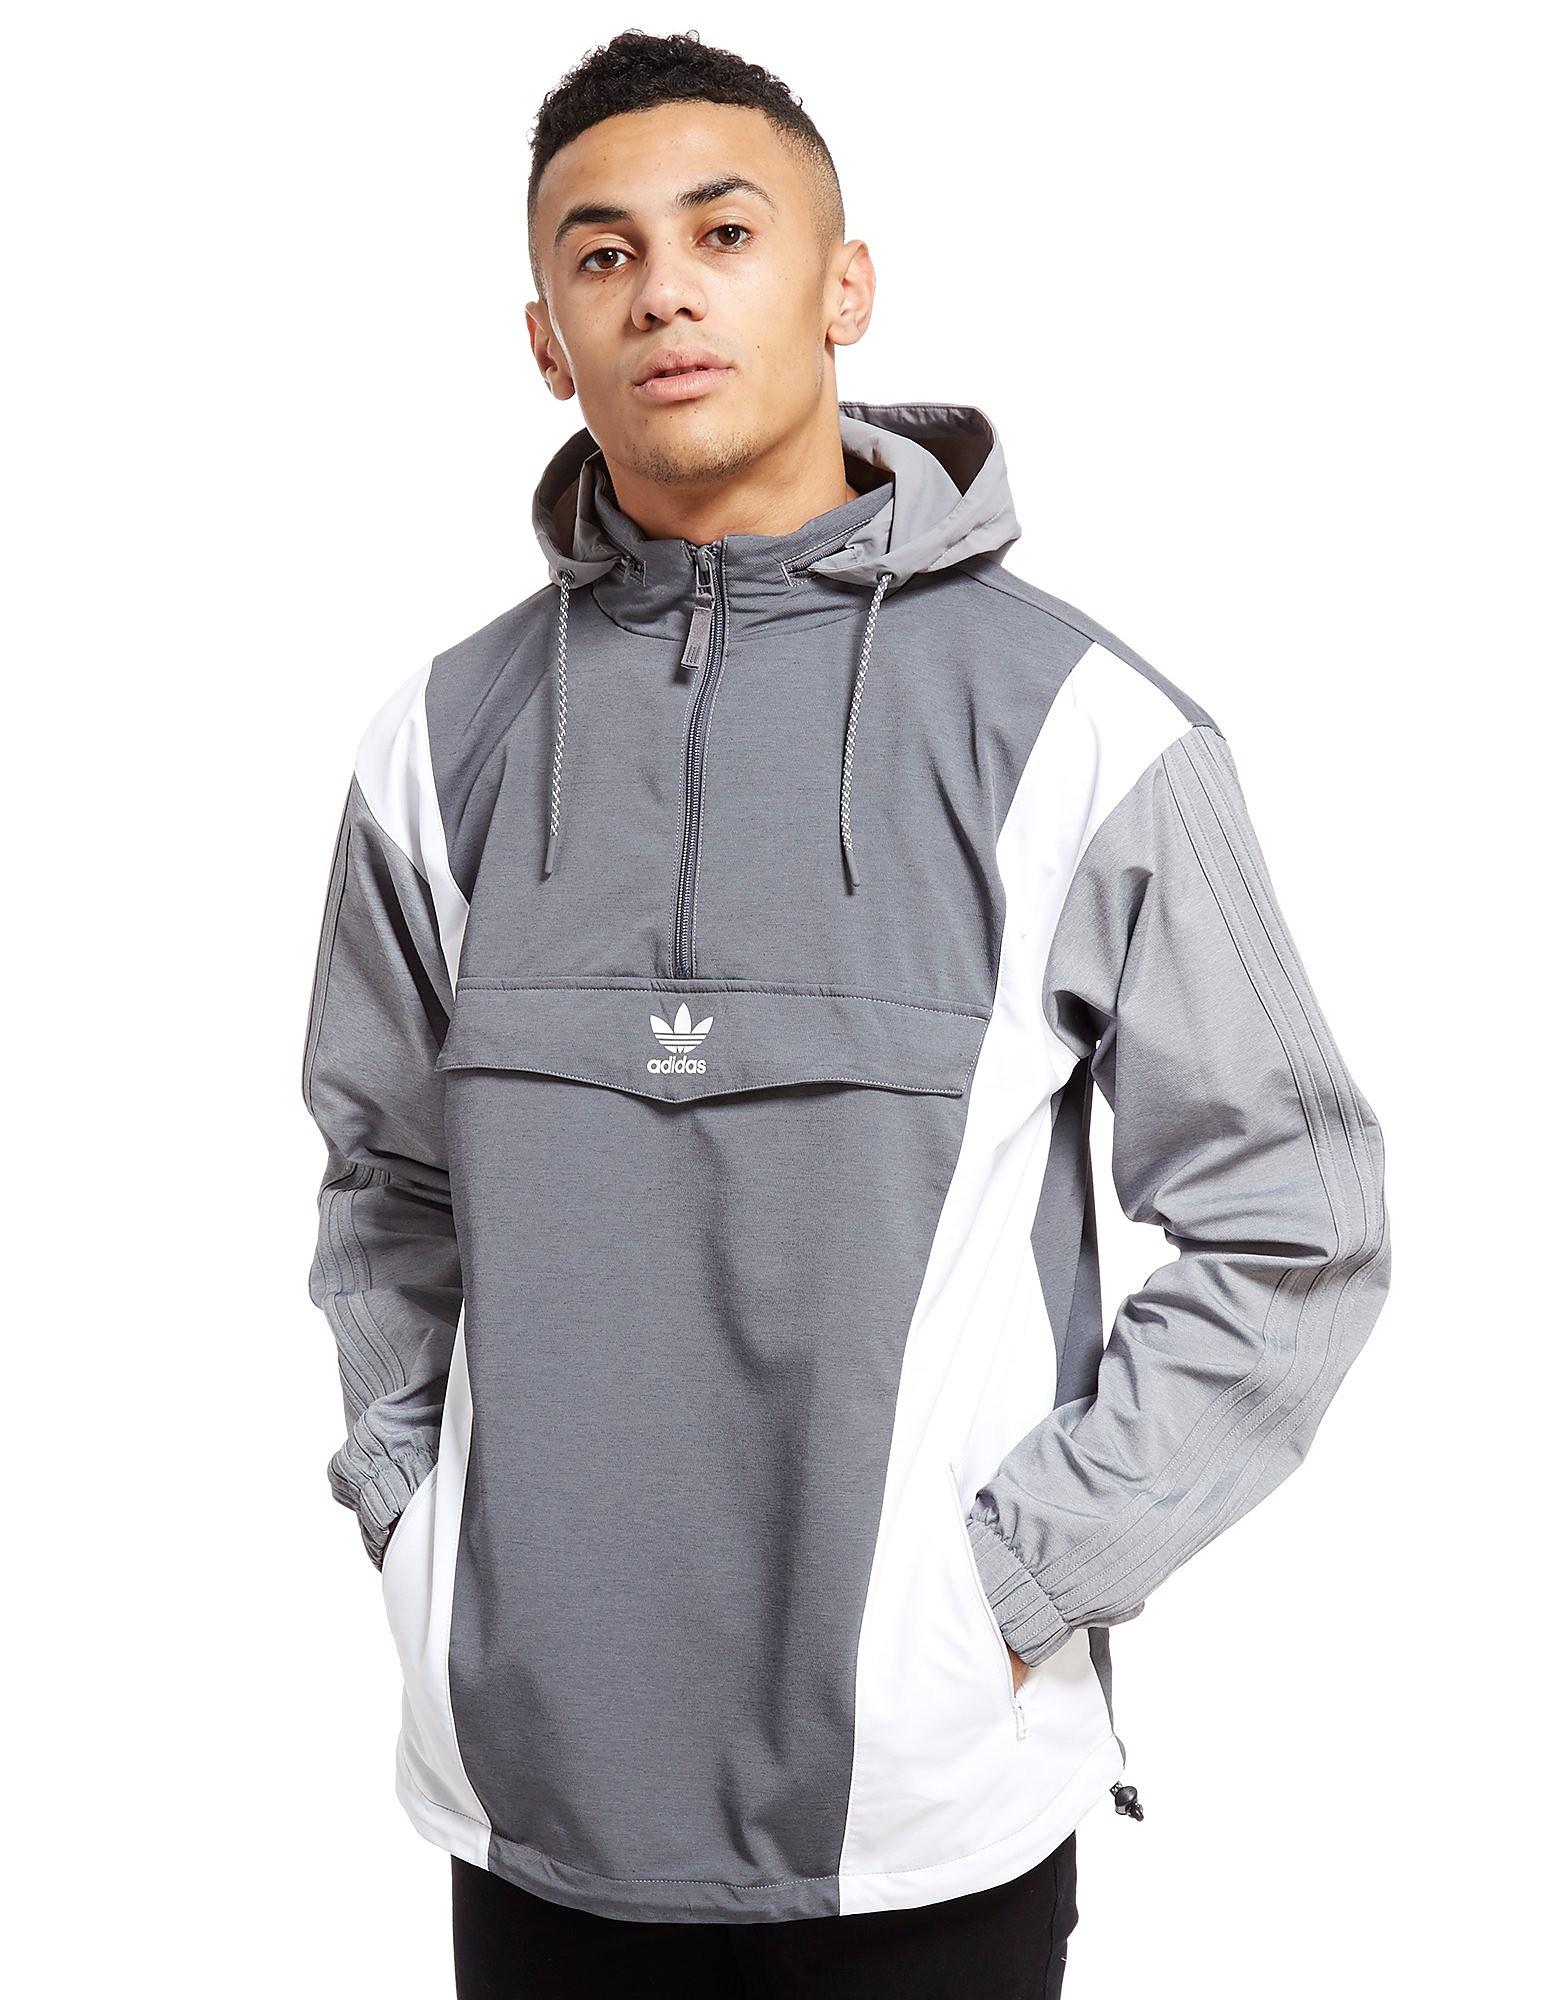 adidas Originals Nova Half Zip Jacket